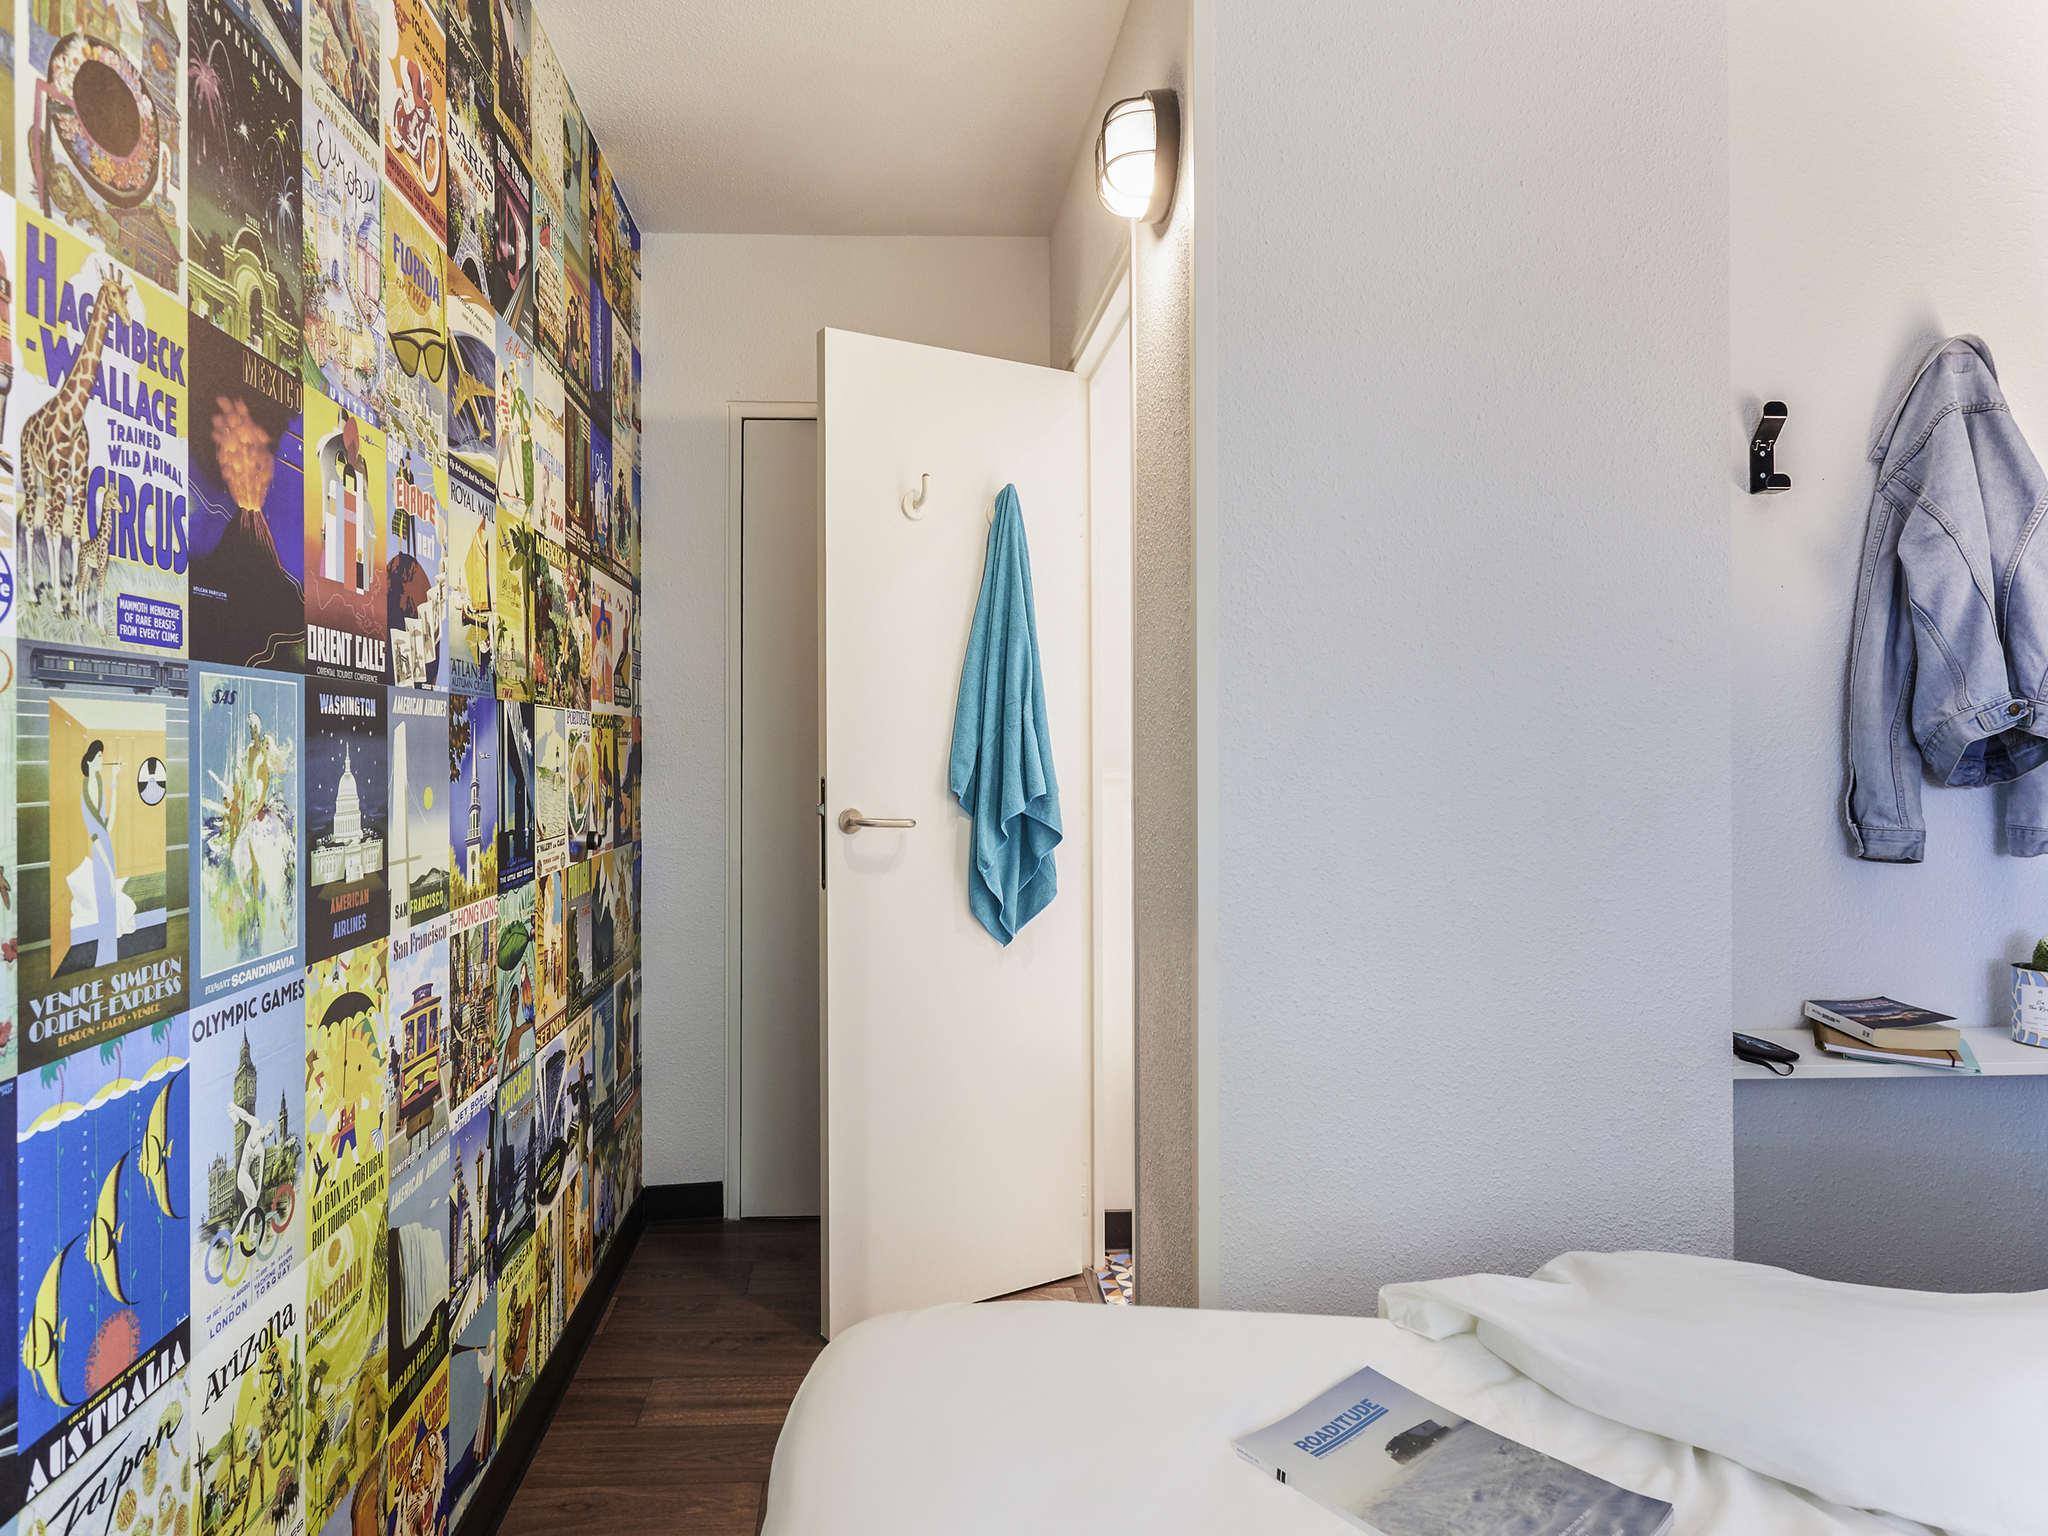 Hotel – hotelF1 Mulhouse Bâle Aéroport